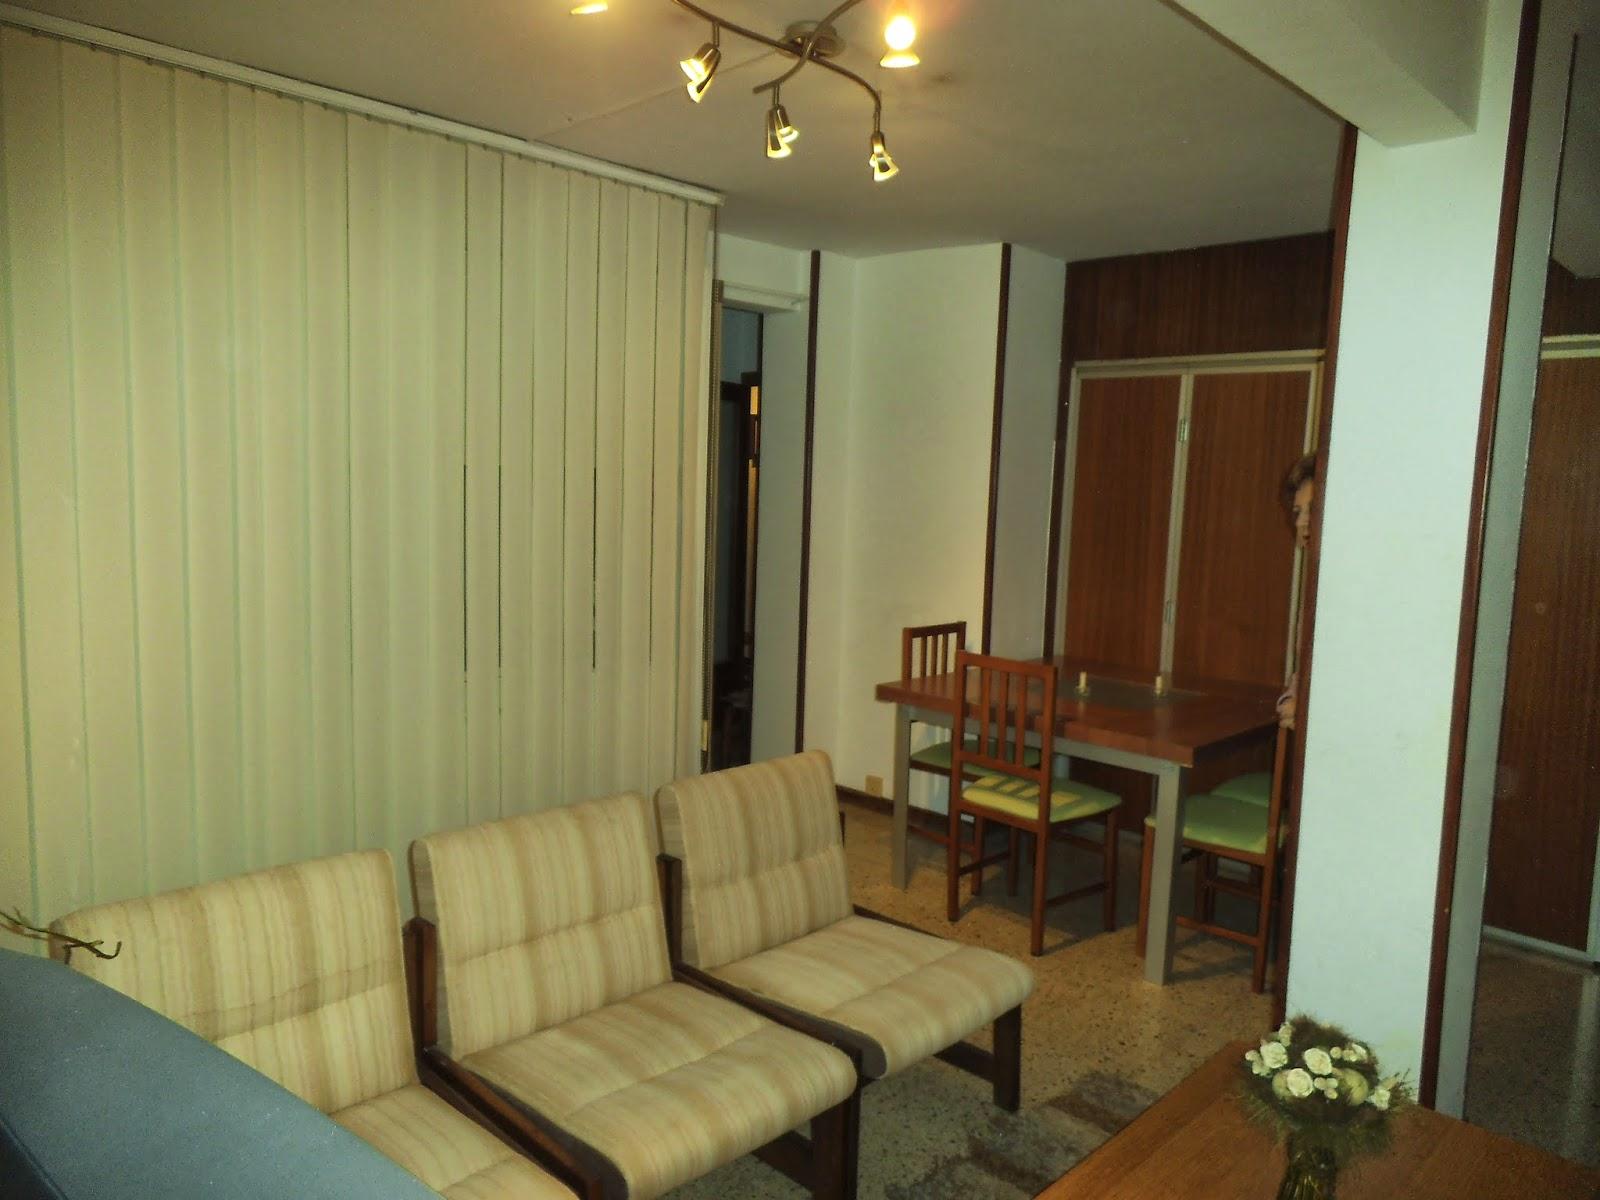 pisos en alquiler baratos en collado villalba particulares nou barris